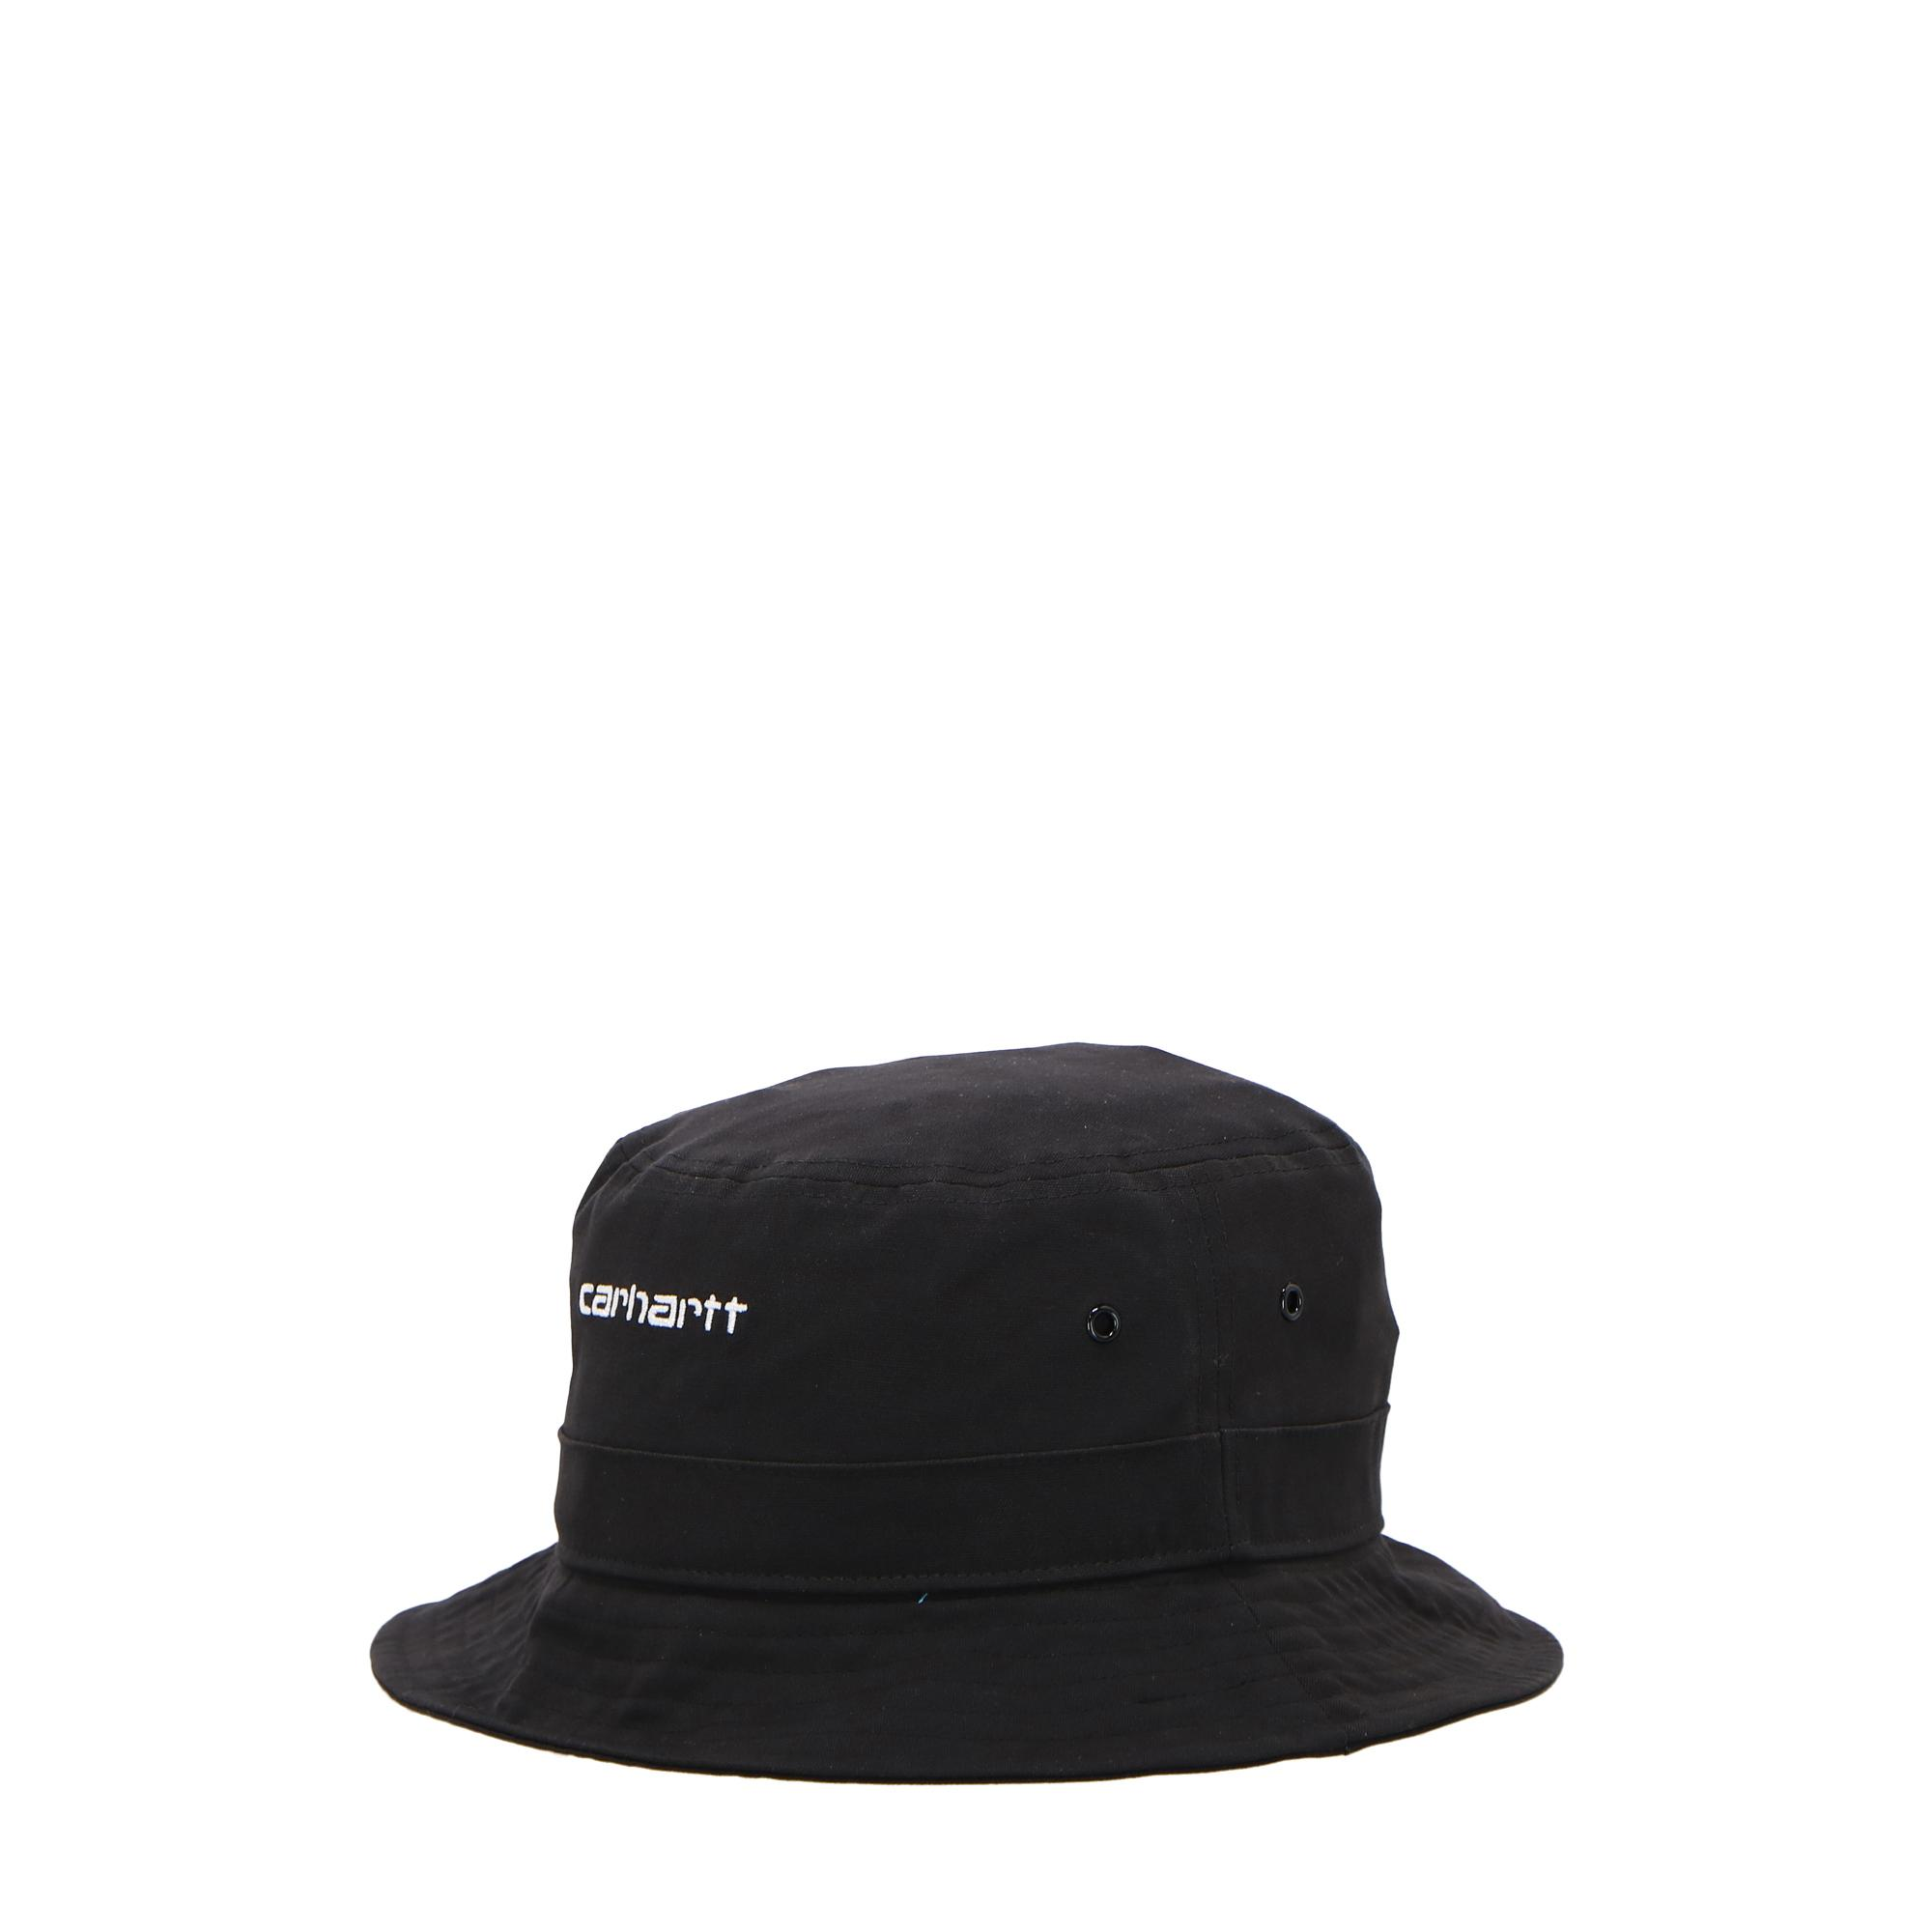 Carhartt Script Bucket Hat Black white